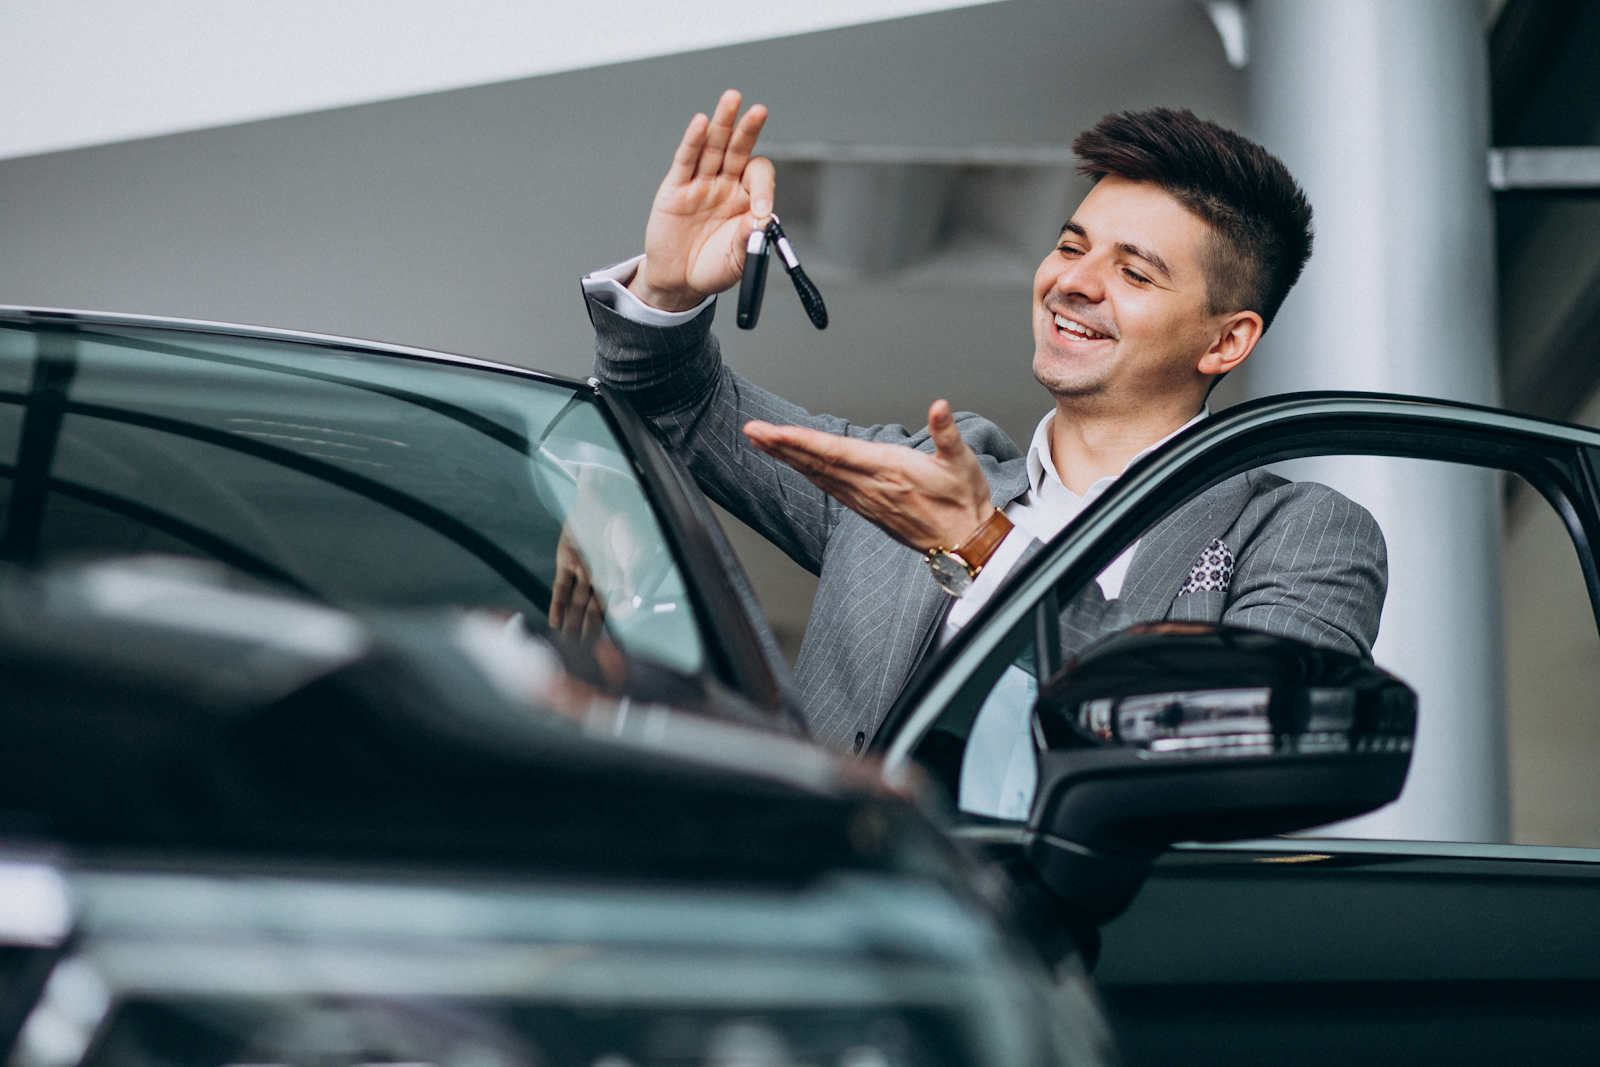 Enterprise Rent-A-Car in Federal Way